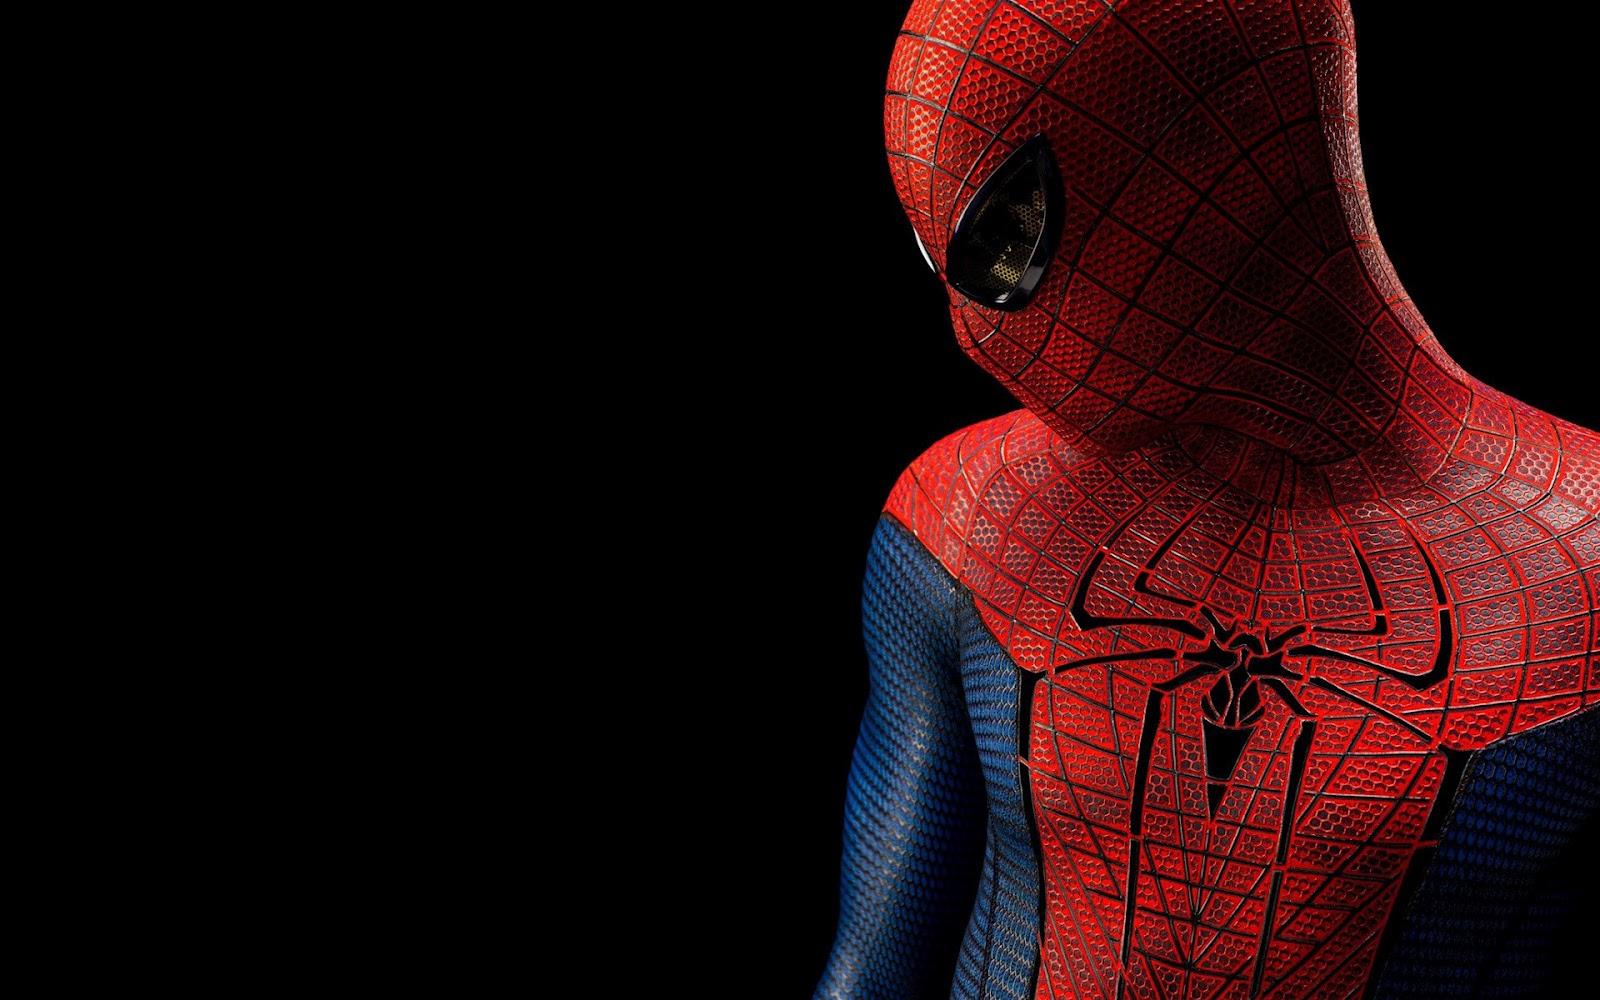 http://1.bp.blogspot.com/-aNjfYRHJMeA/T7eFwIn7reI/AAAAAAAAAYU/8UrremJyUvQ/s1600/The-Amazing-Spider-Man-2012-Wallpaper.jpg